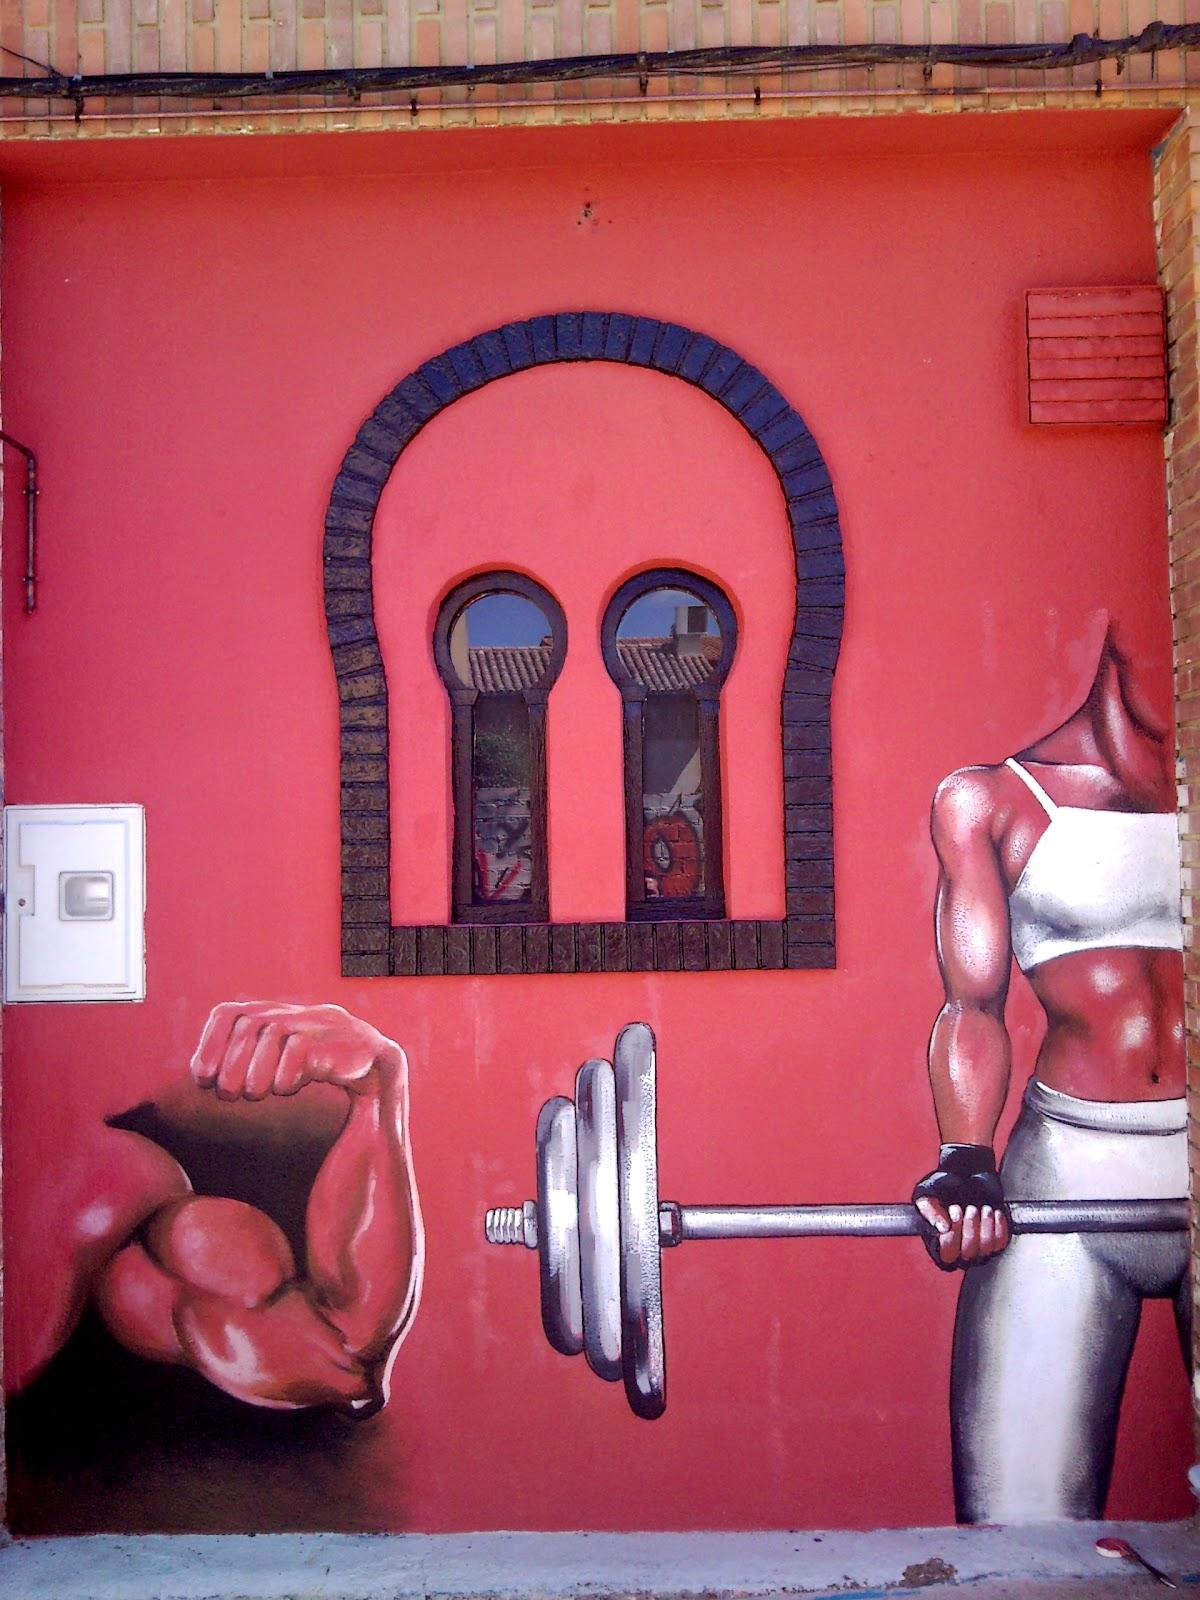 Alfredo alvarez ilustrador decoraci n de la fachada de paradyse gym sahag n - Decoracion de gimnasios ...